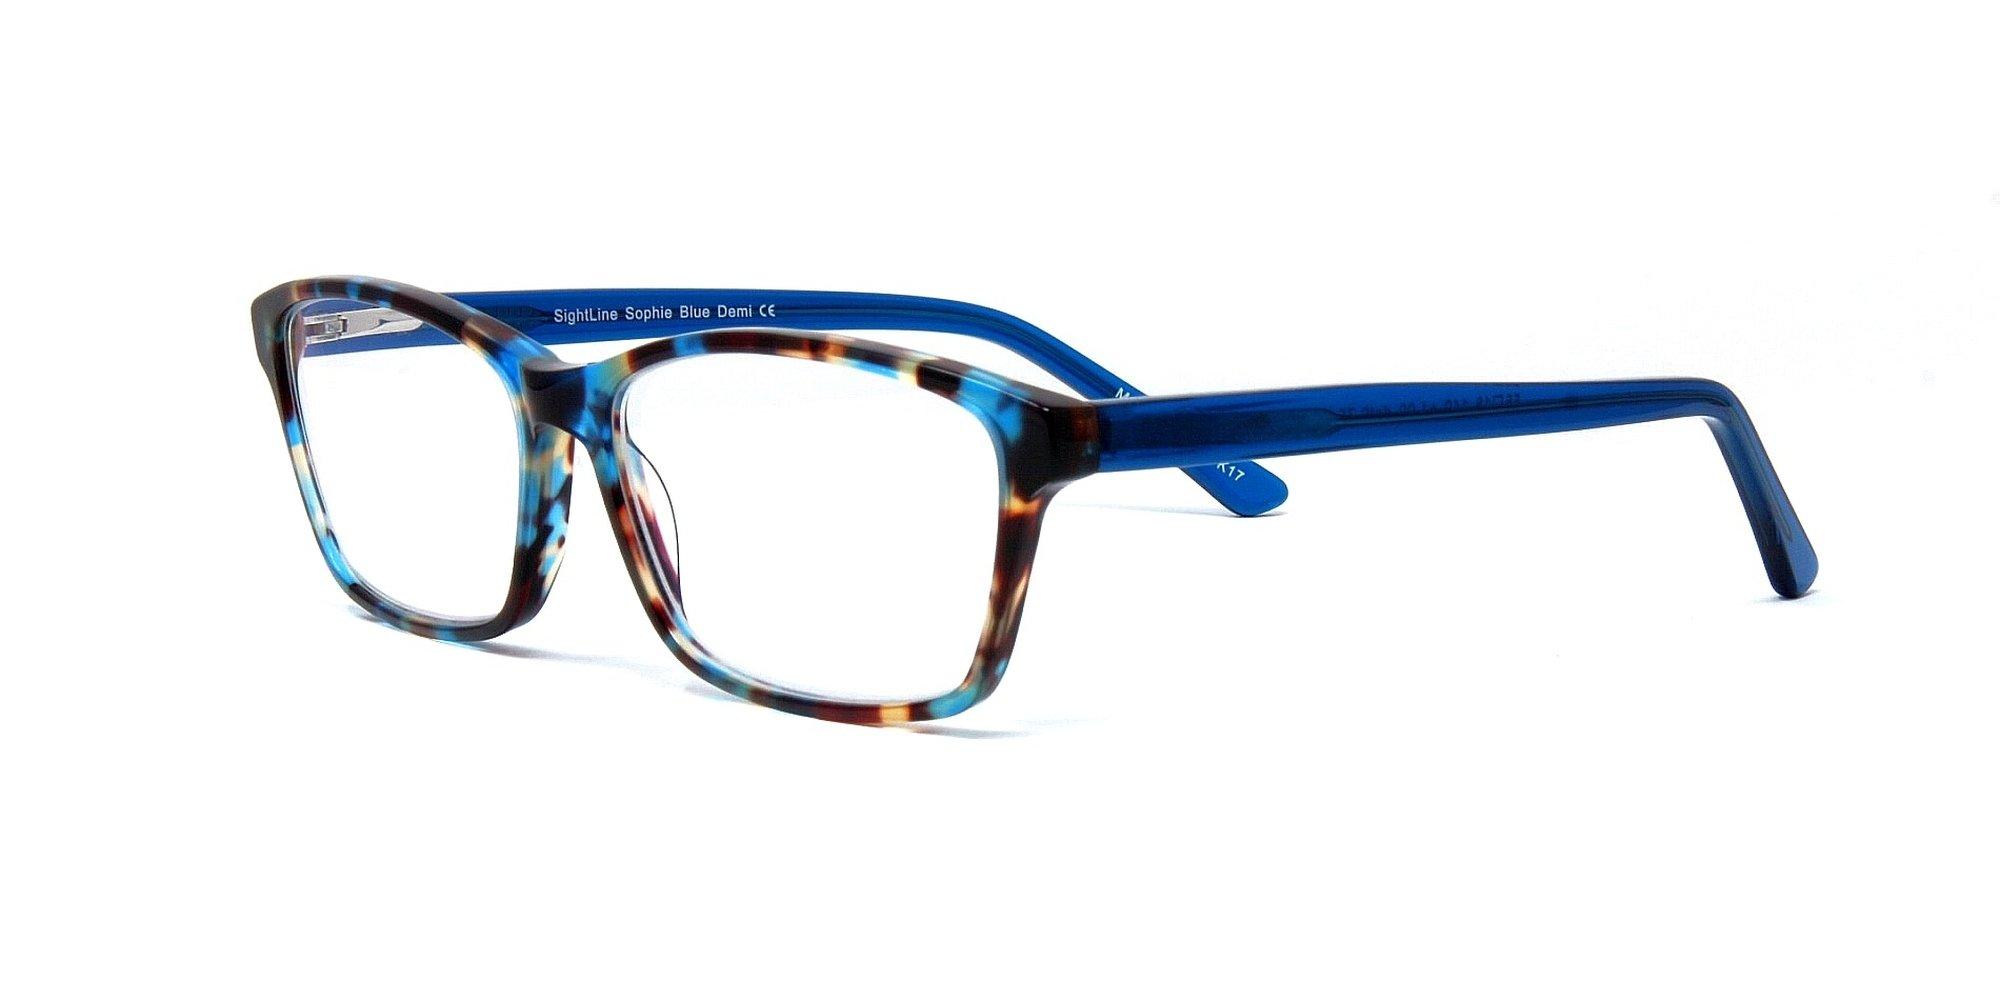 SightLine Sophie Handmade Multifocal Reading Glasses +2.50 Progressive Magnification Lenses With Anti-Glare Coating; Frame Size: 55-15/140